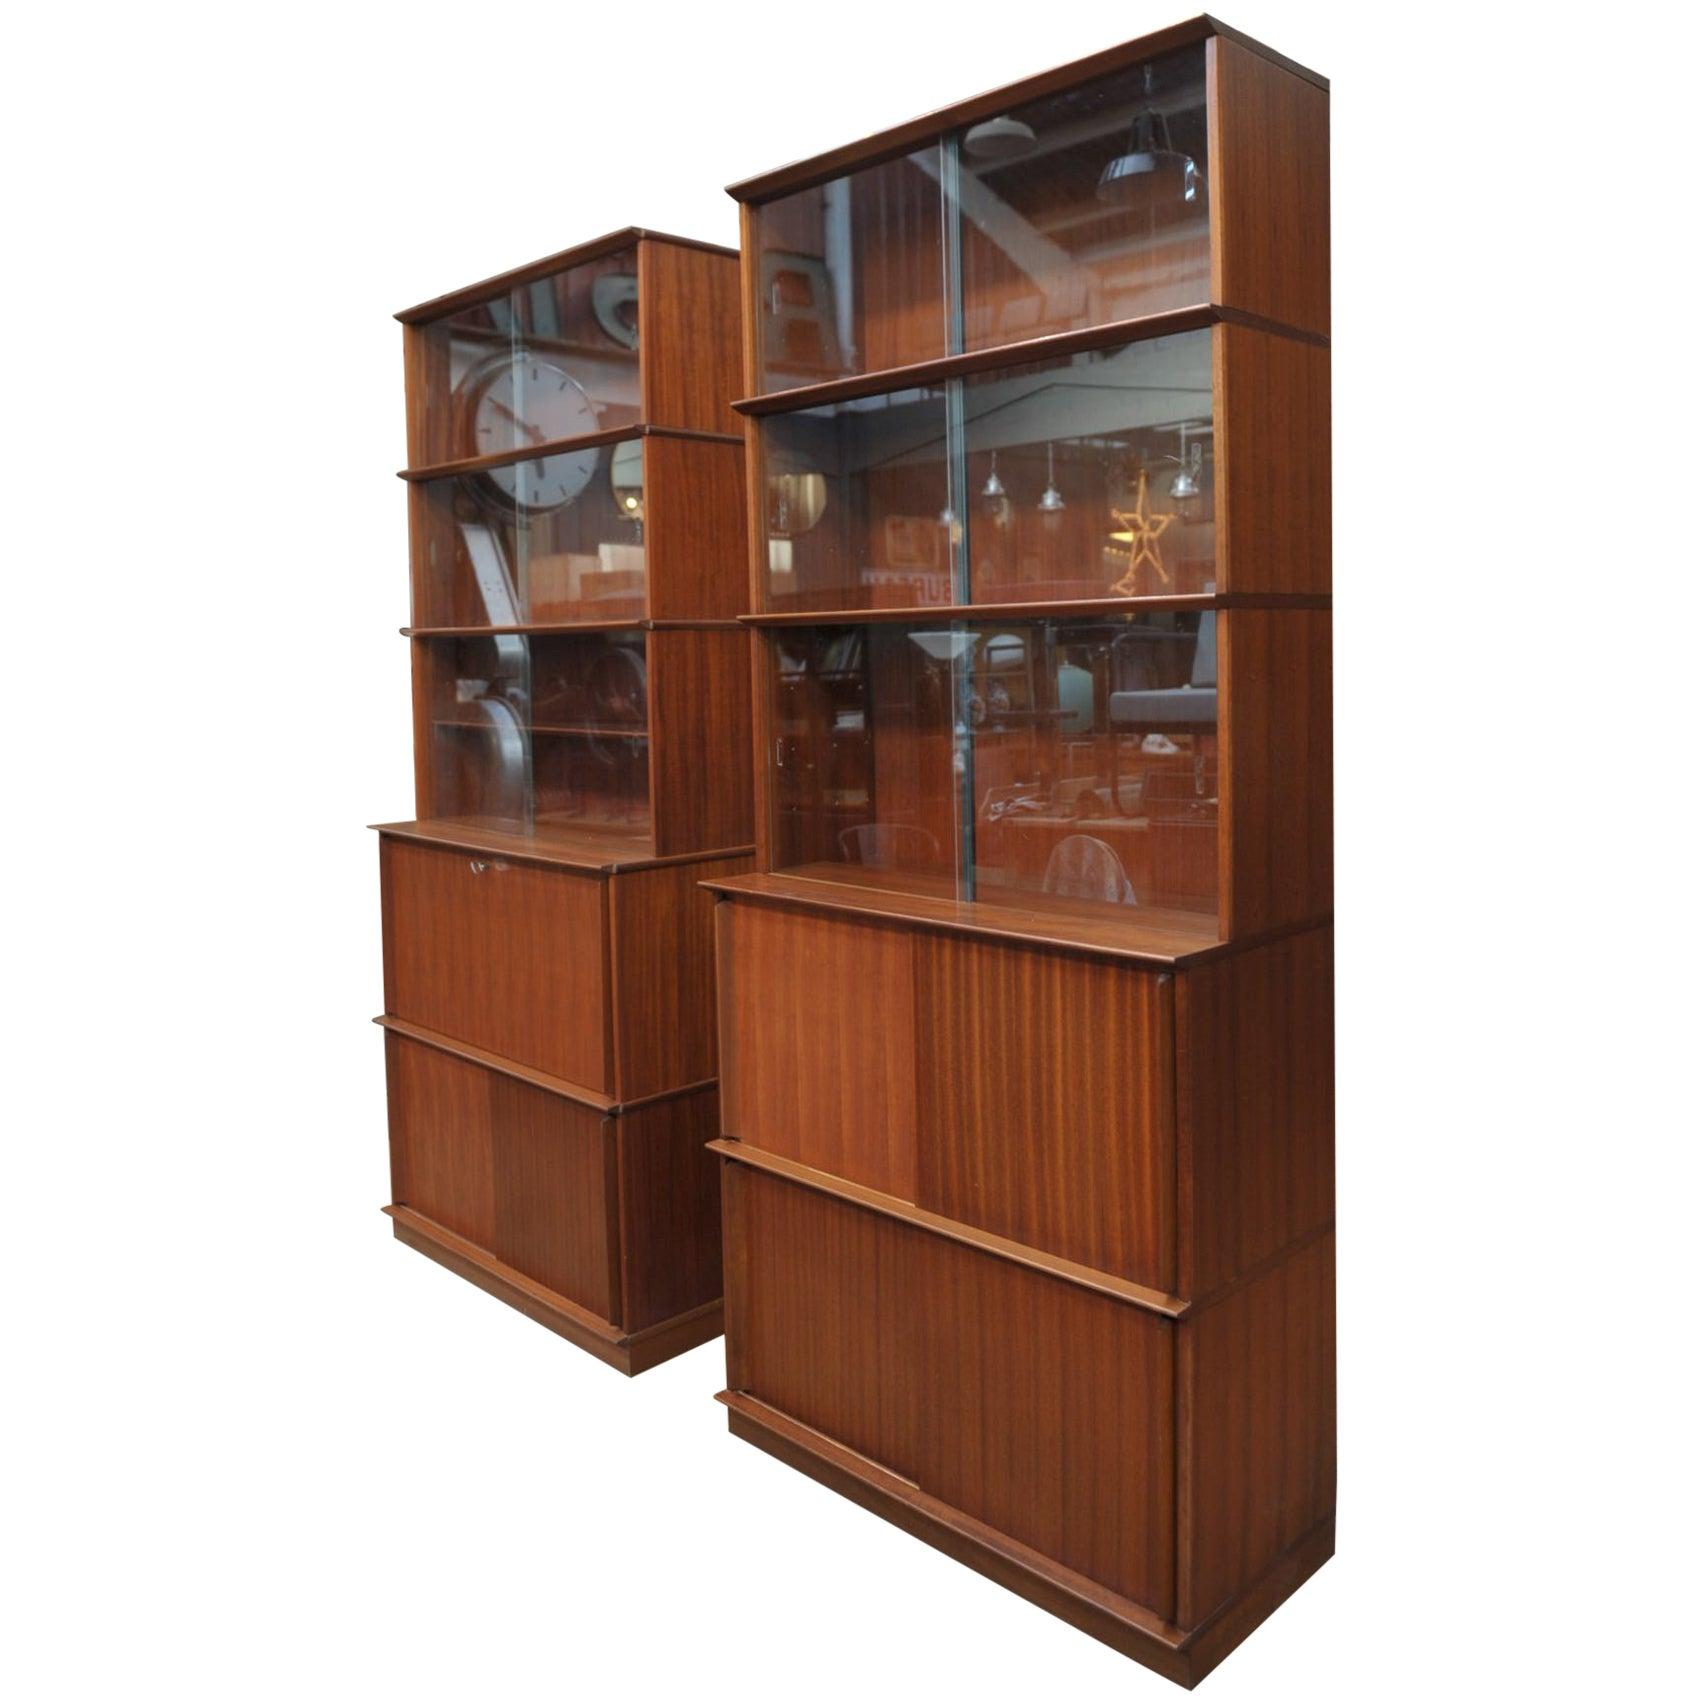 Pair of Teak Secretaire and Sliding Doors Bookcase Cabinets, circa 1960